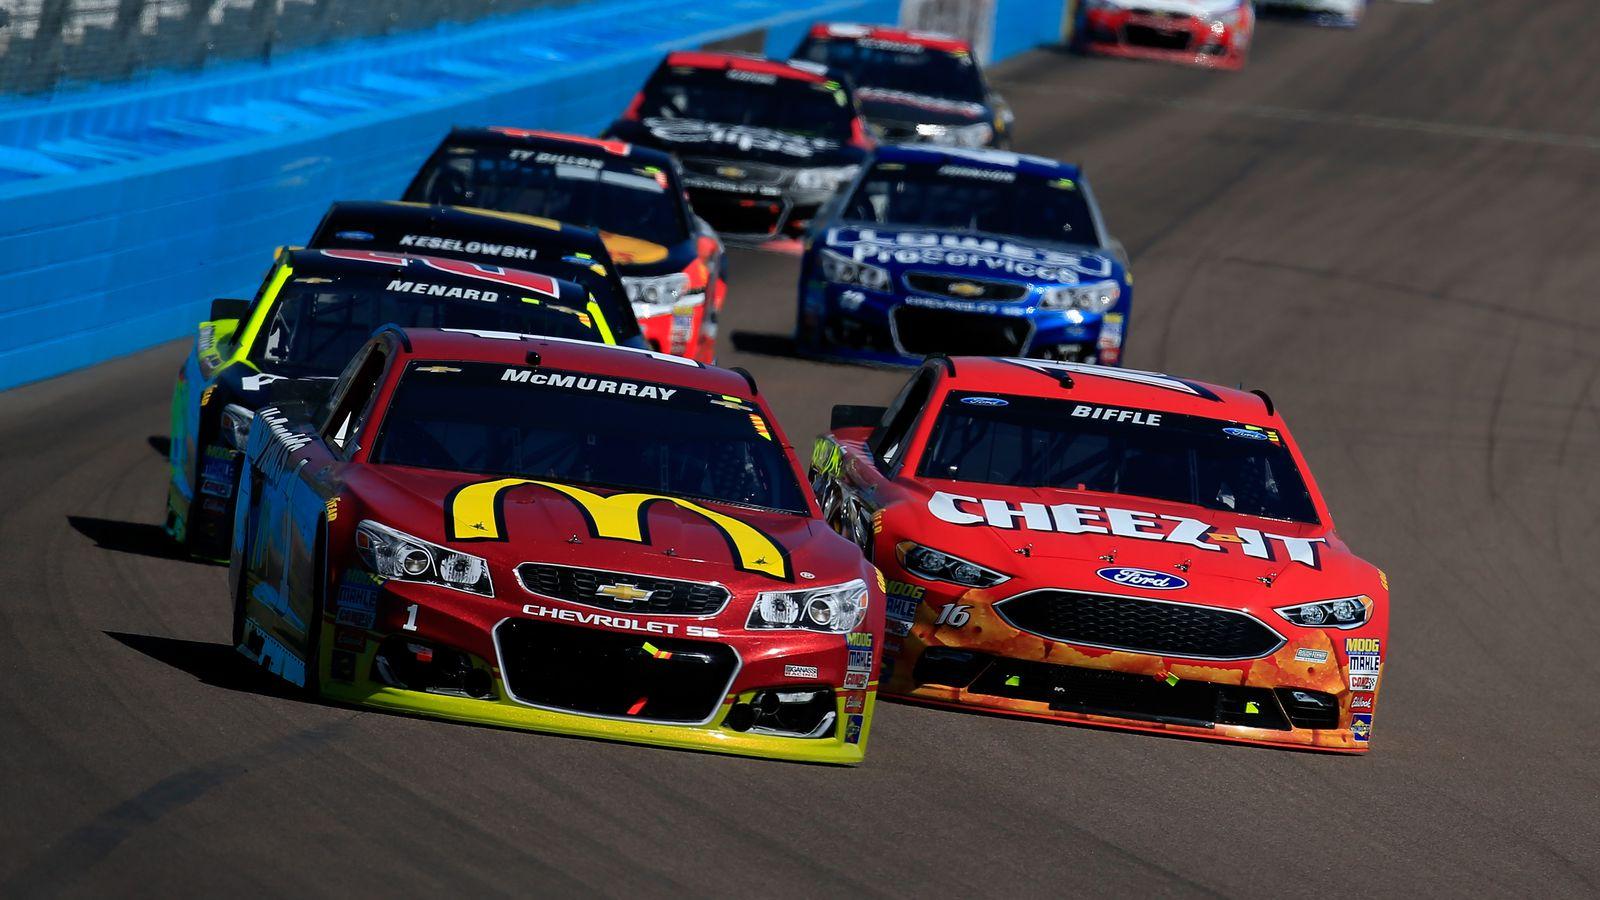 NASCAR首席执行官:多家汽车制造商希望参与这项运动